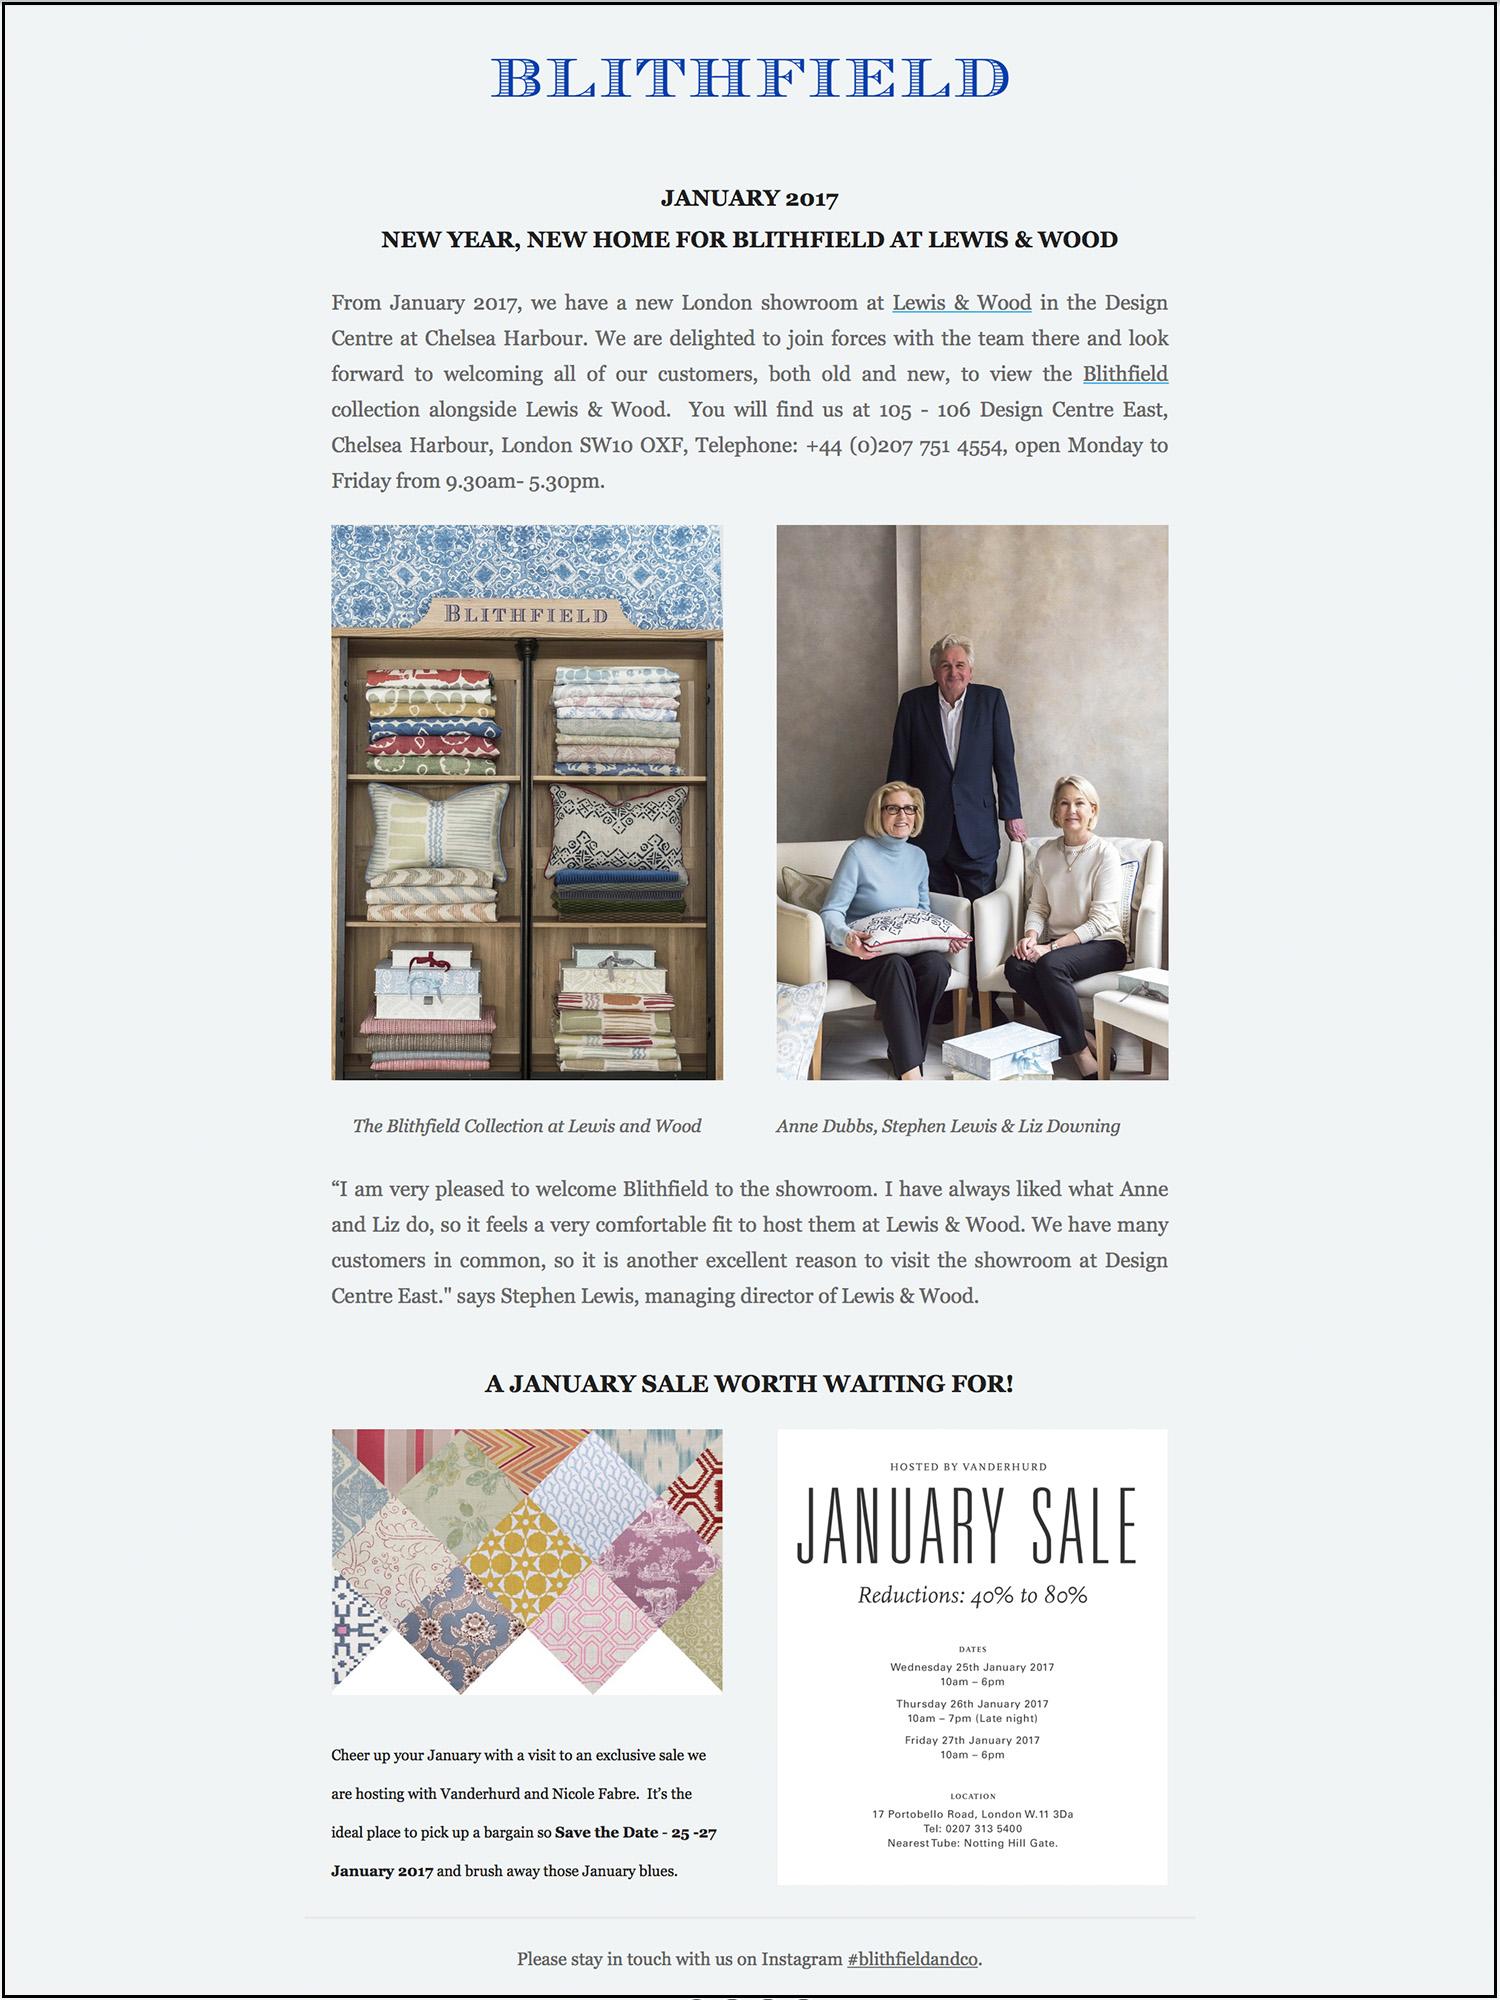 Blithfield's New London Showroom January 2017.jpg